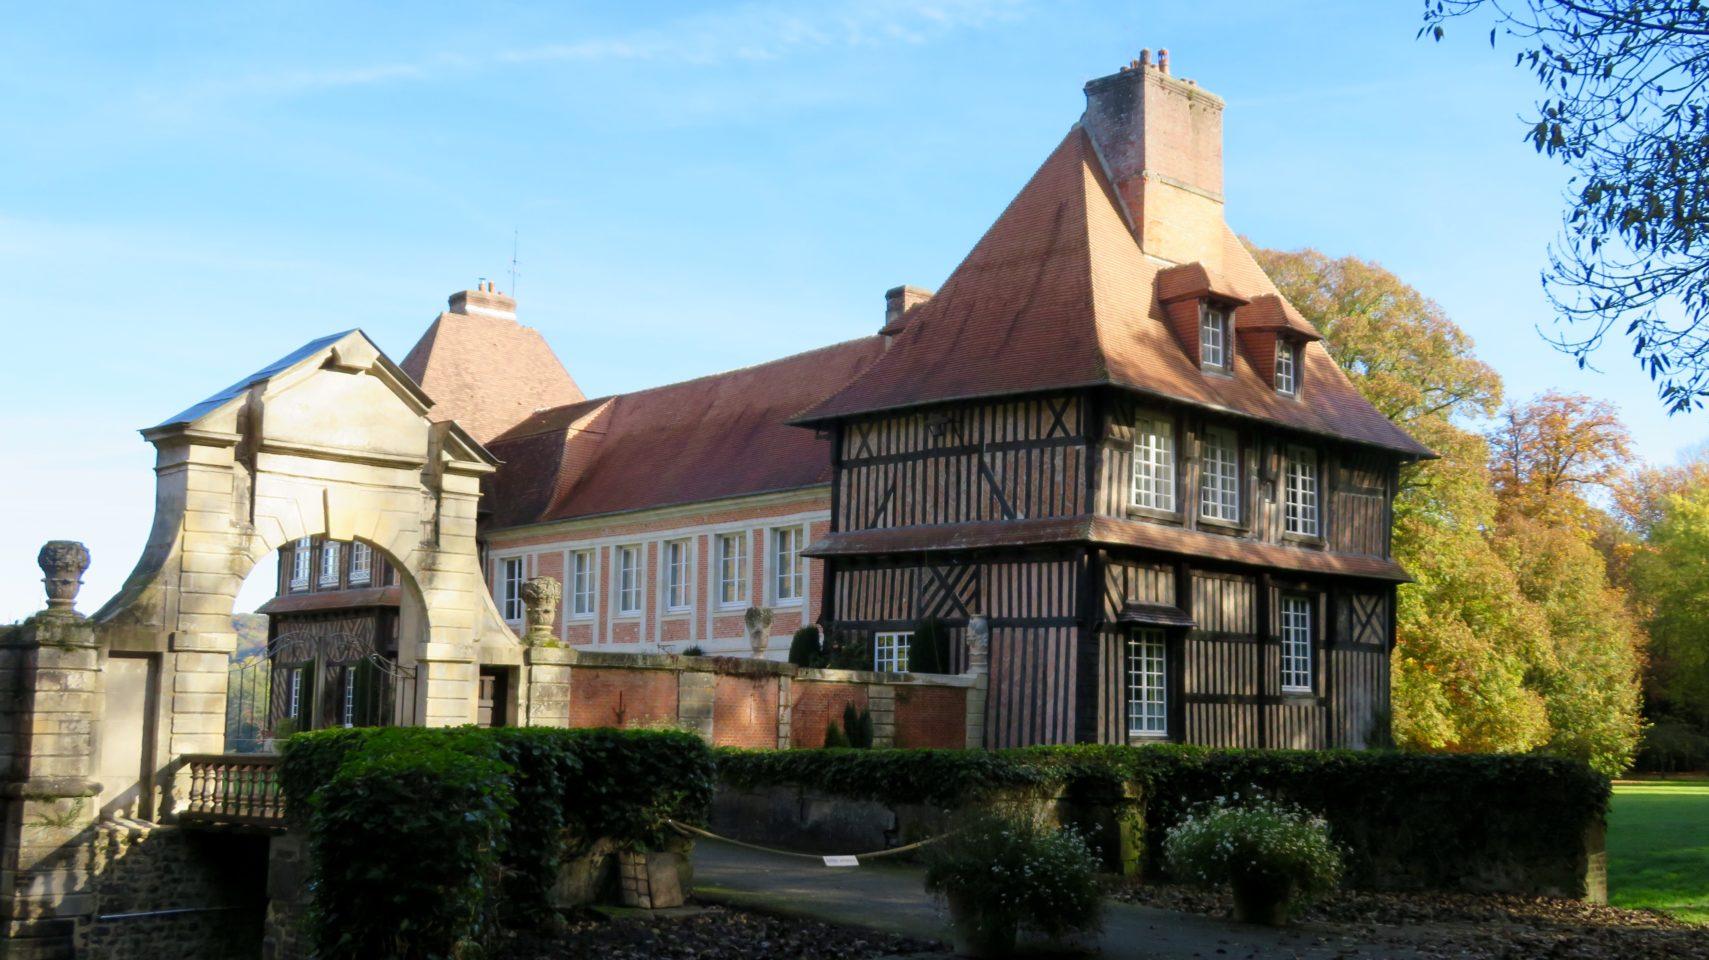 Chateau du Breuil in Normandie, France (Paris and Normandie AMAWaterways Cruise)